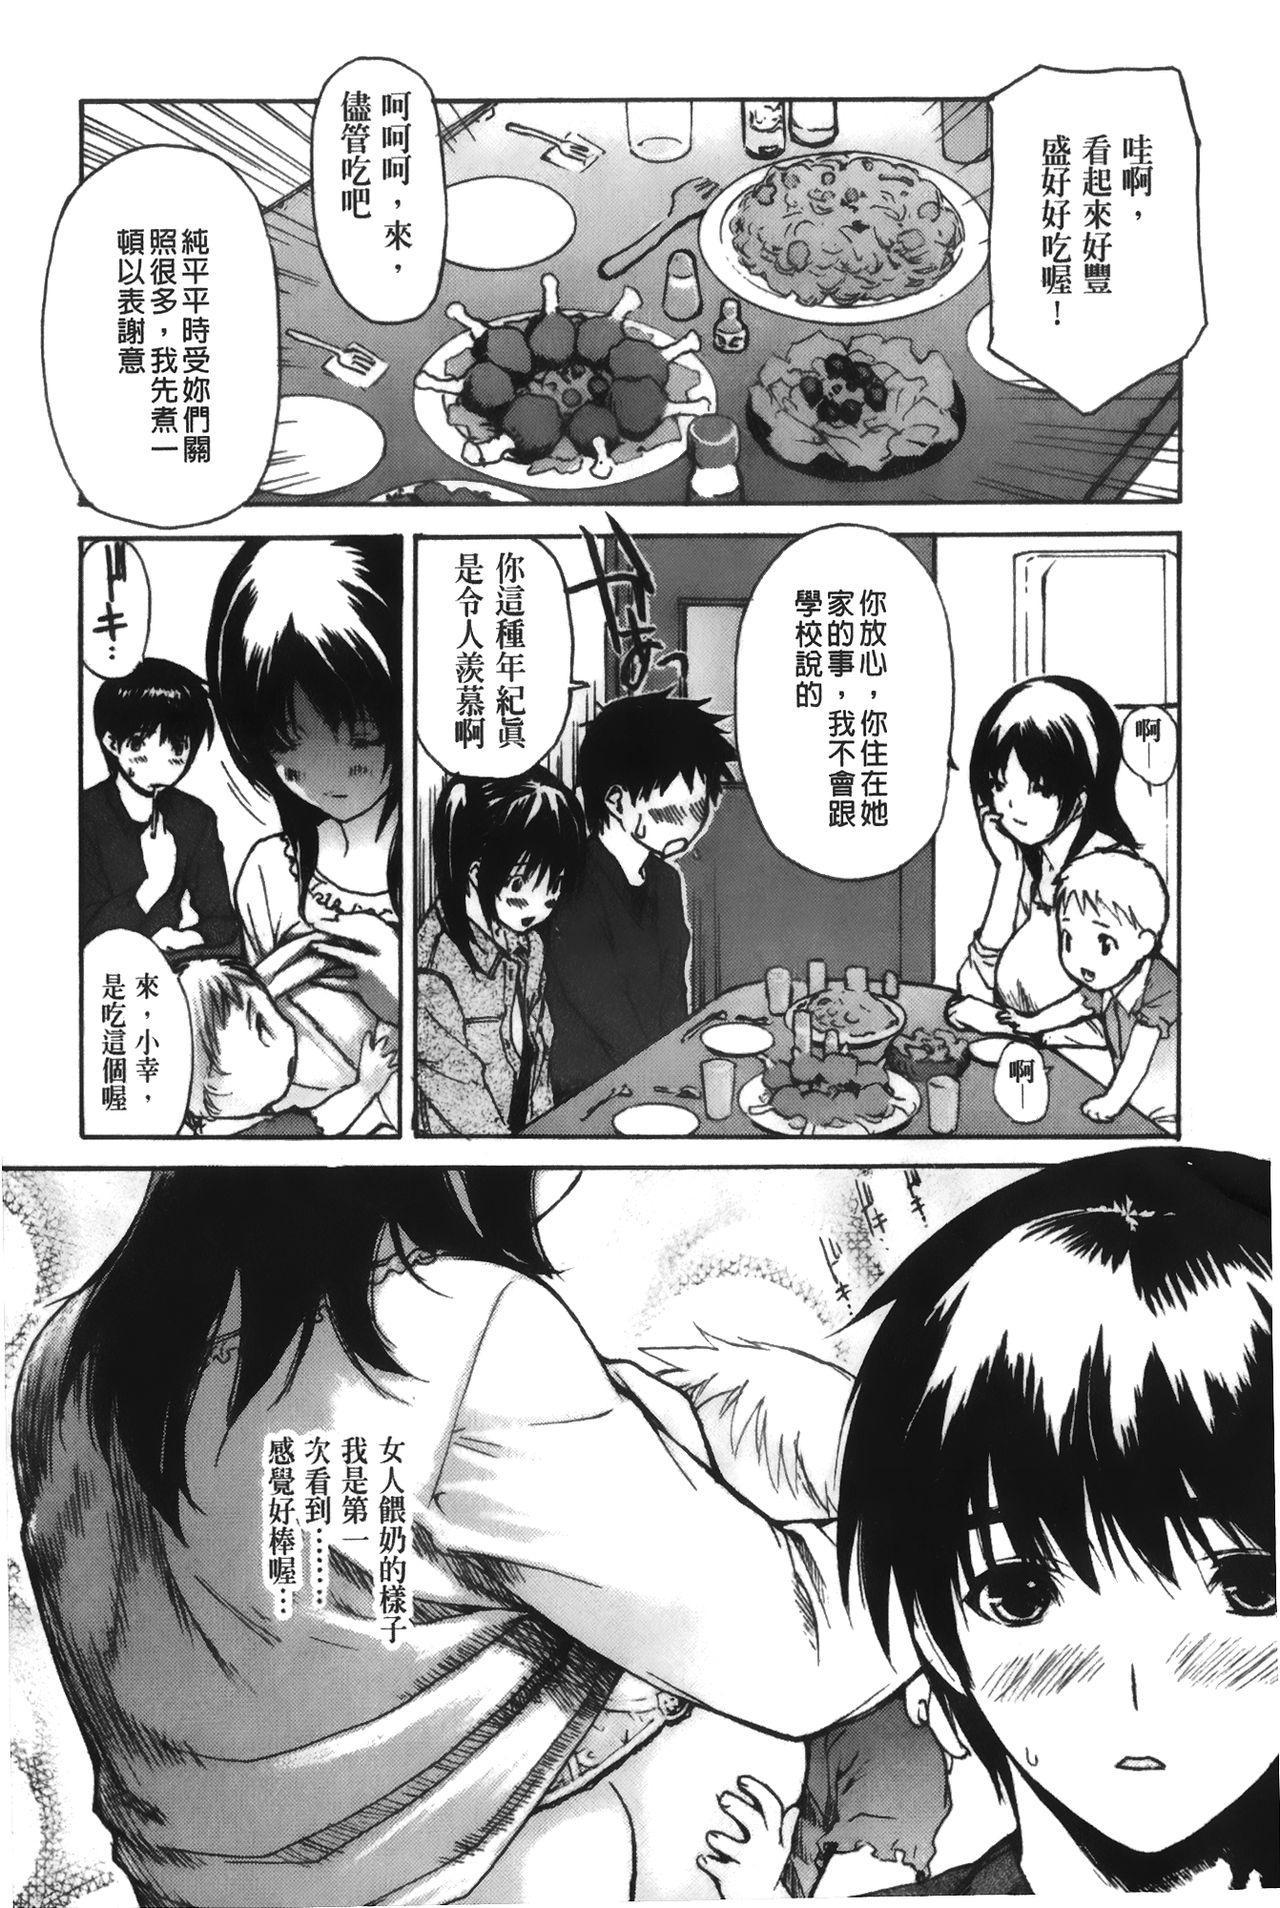 Tonari no Minano Sensei 4 | 隔壁的美奈乃老師 4 58